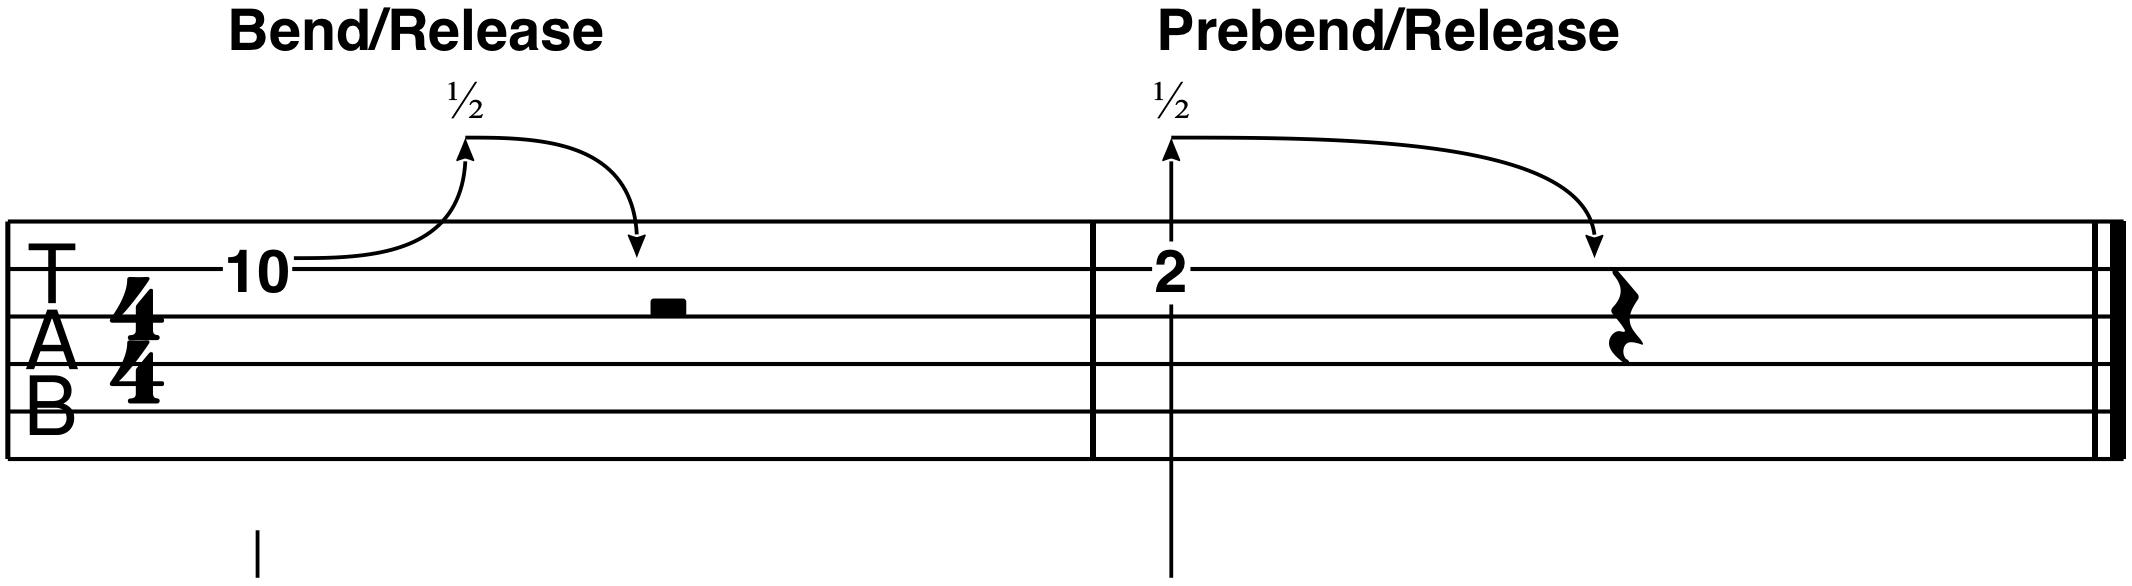 cgo-guitar-tablature-bends-example-2